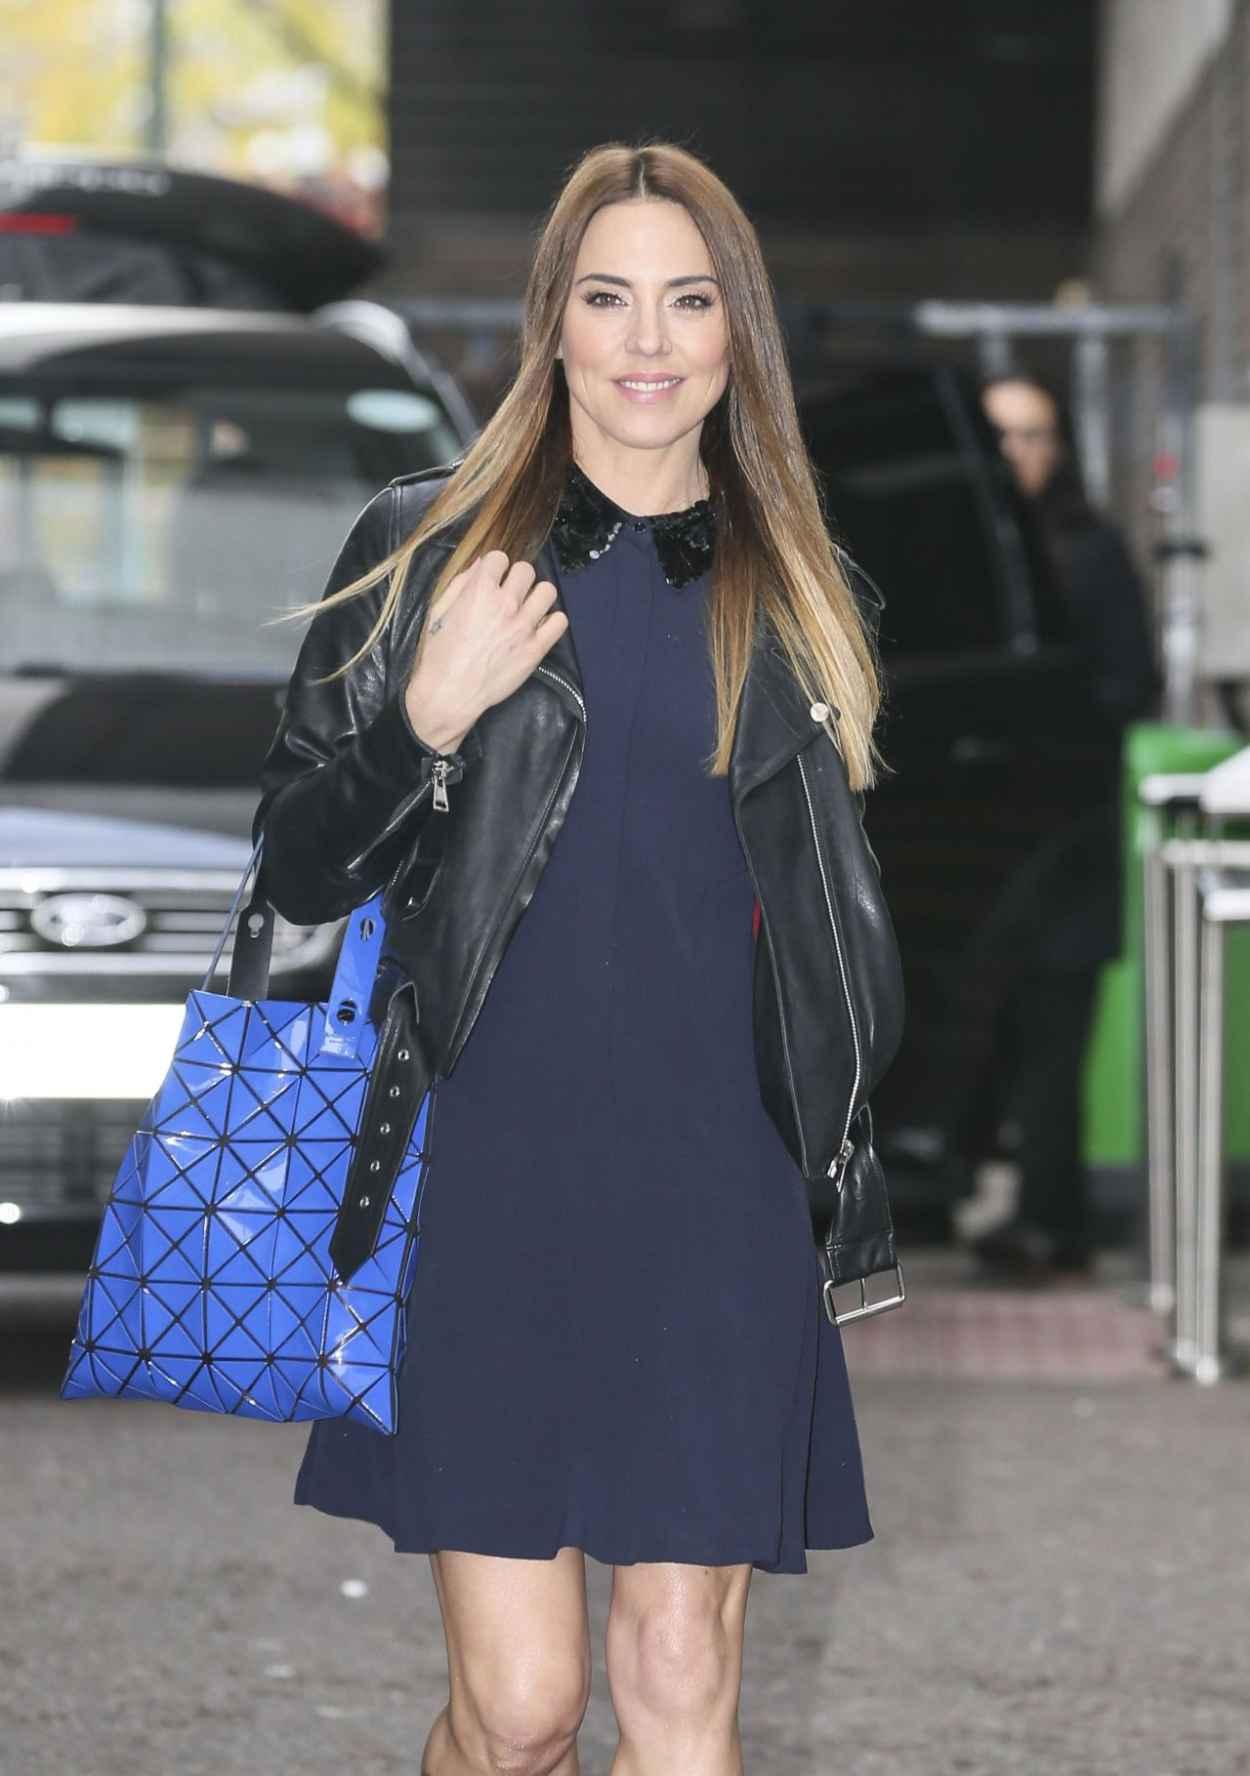 Melanie Chisholm Style - Seen at ITV Studios in London - November 2015-1